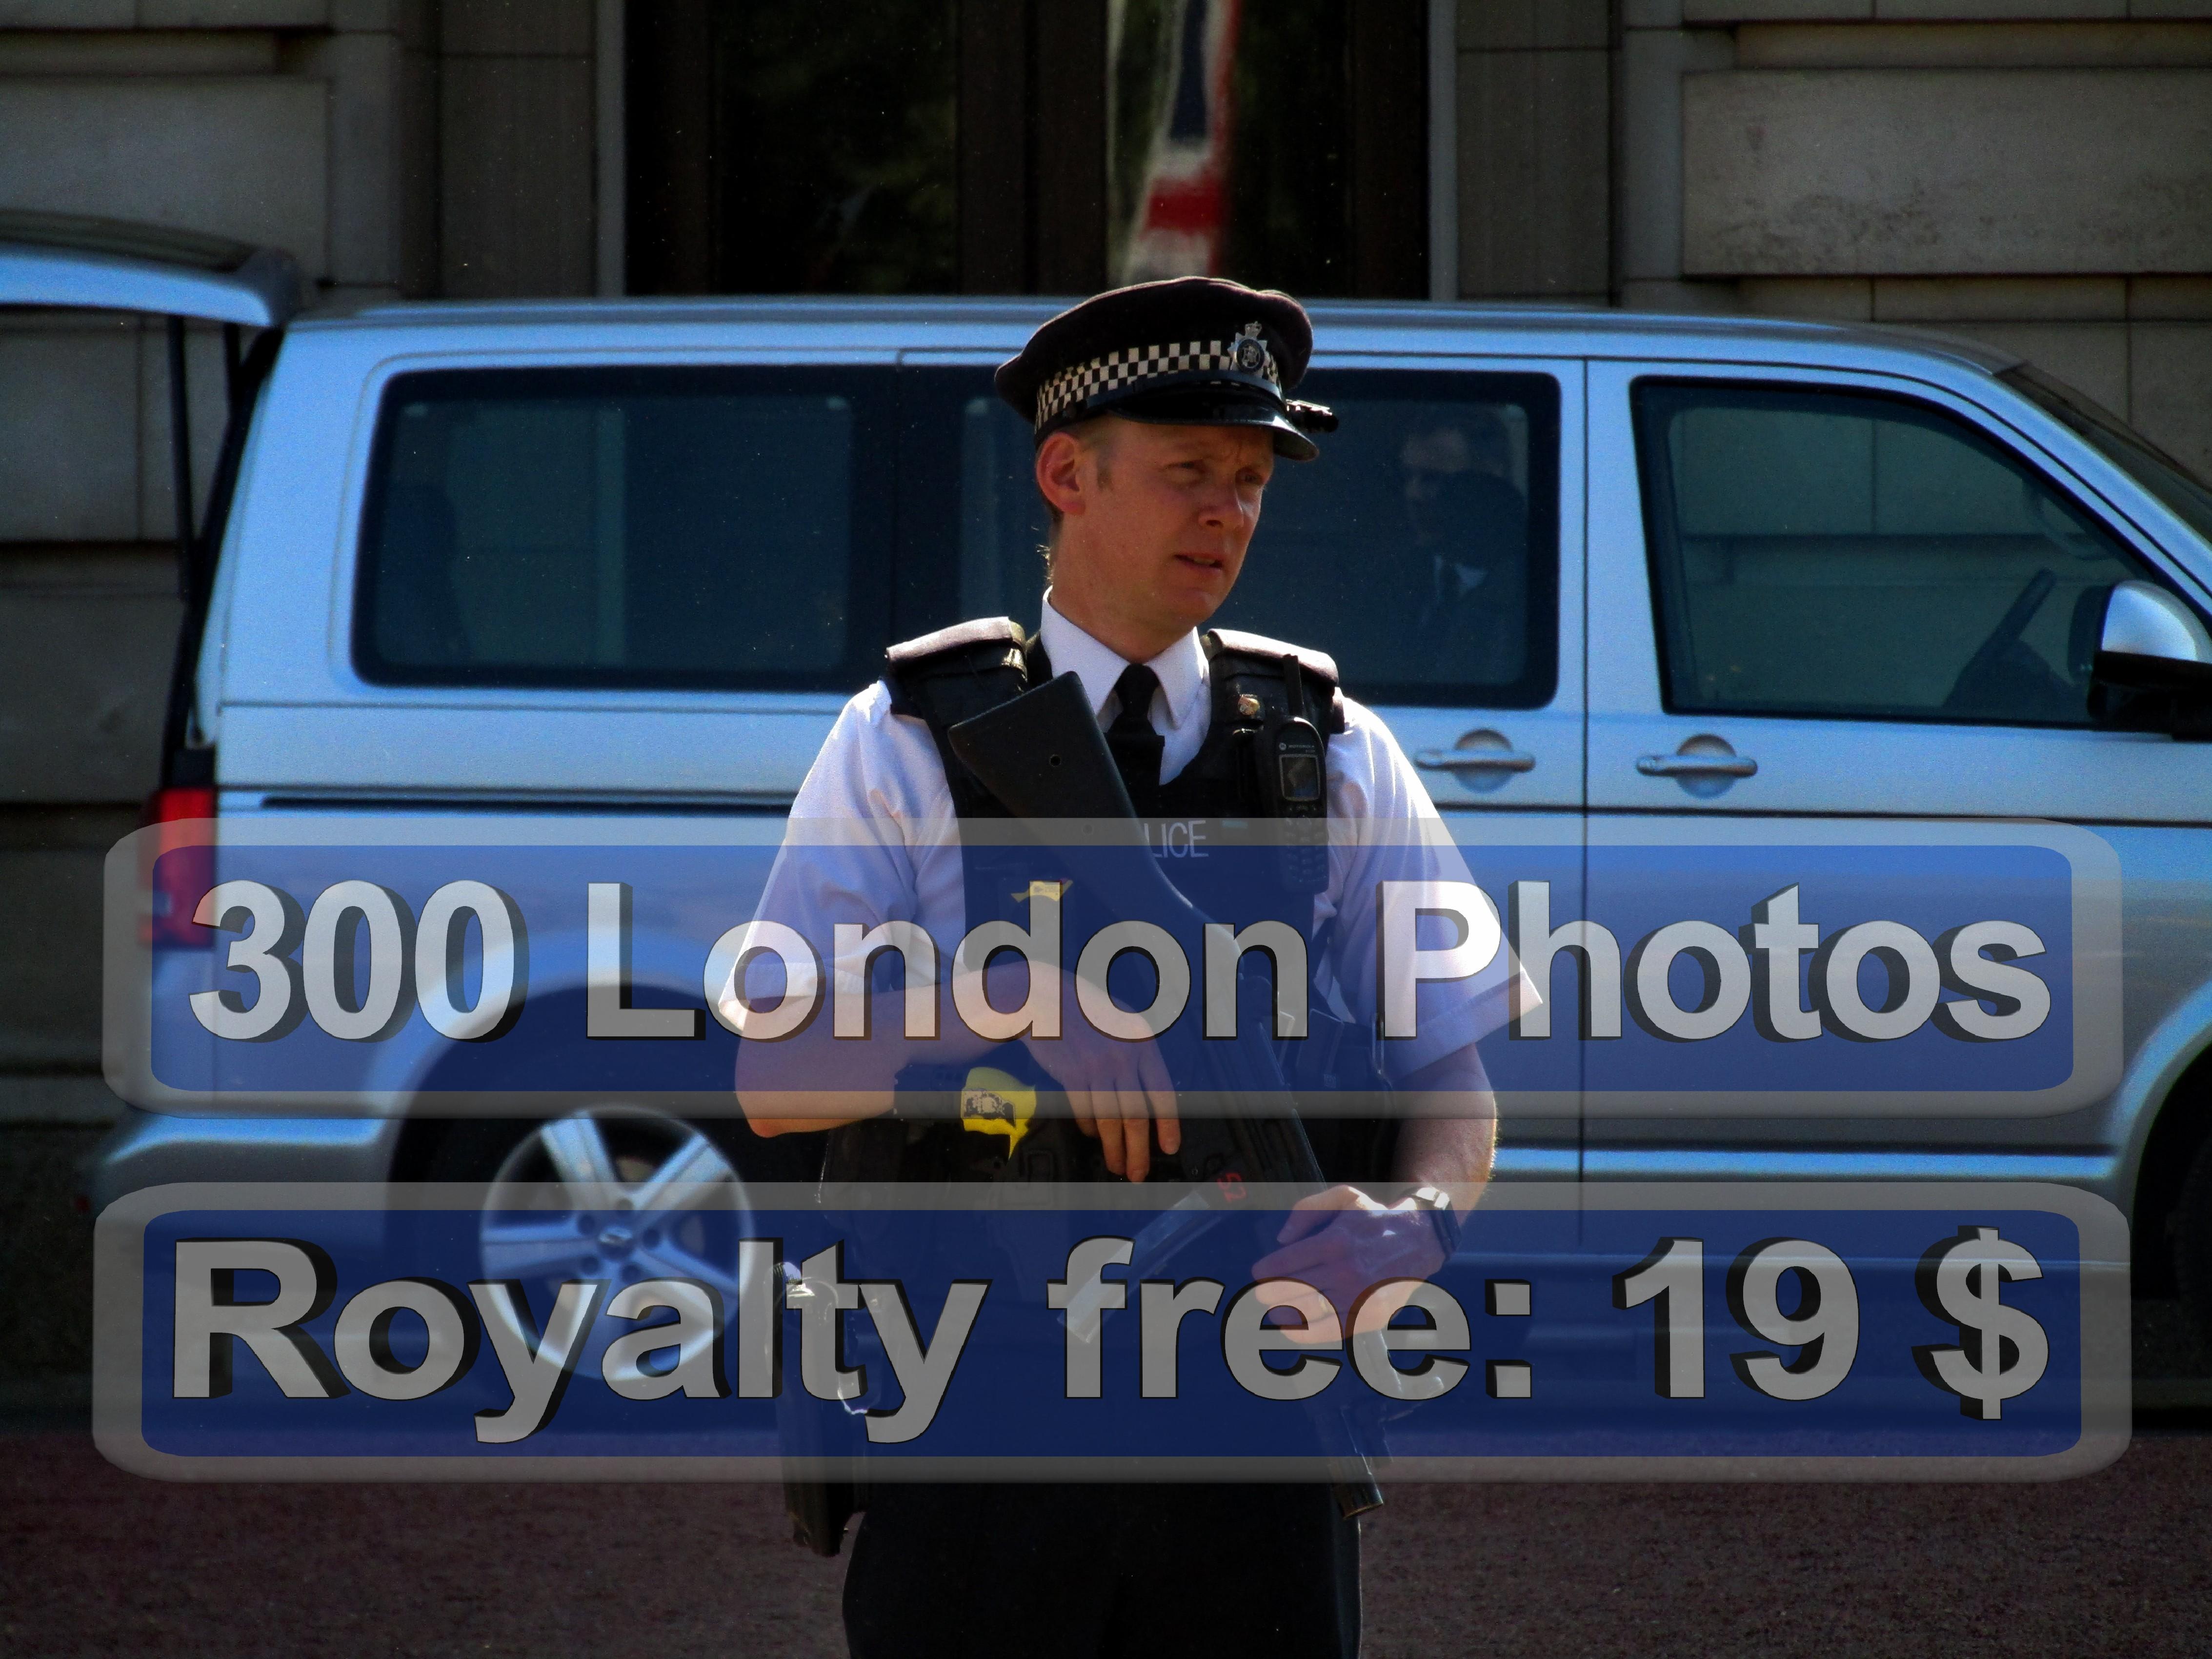 London Photo Camera Shop